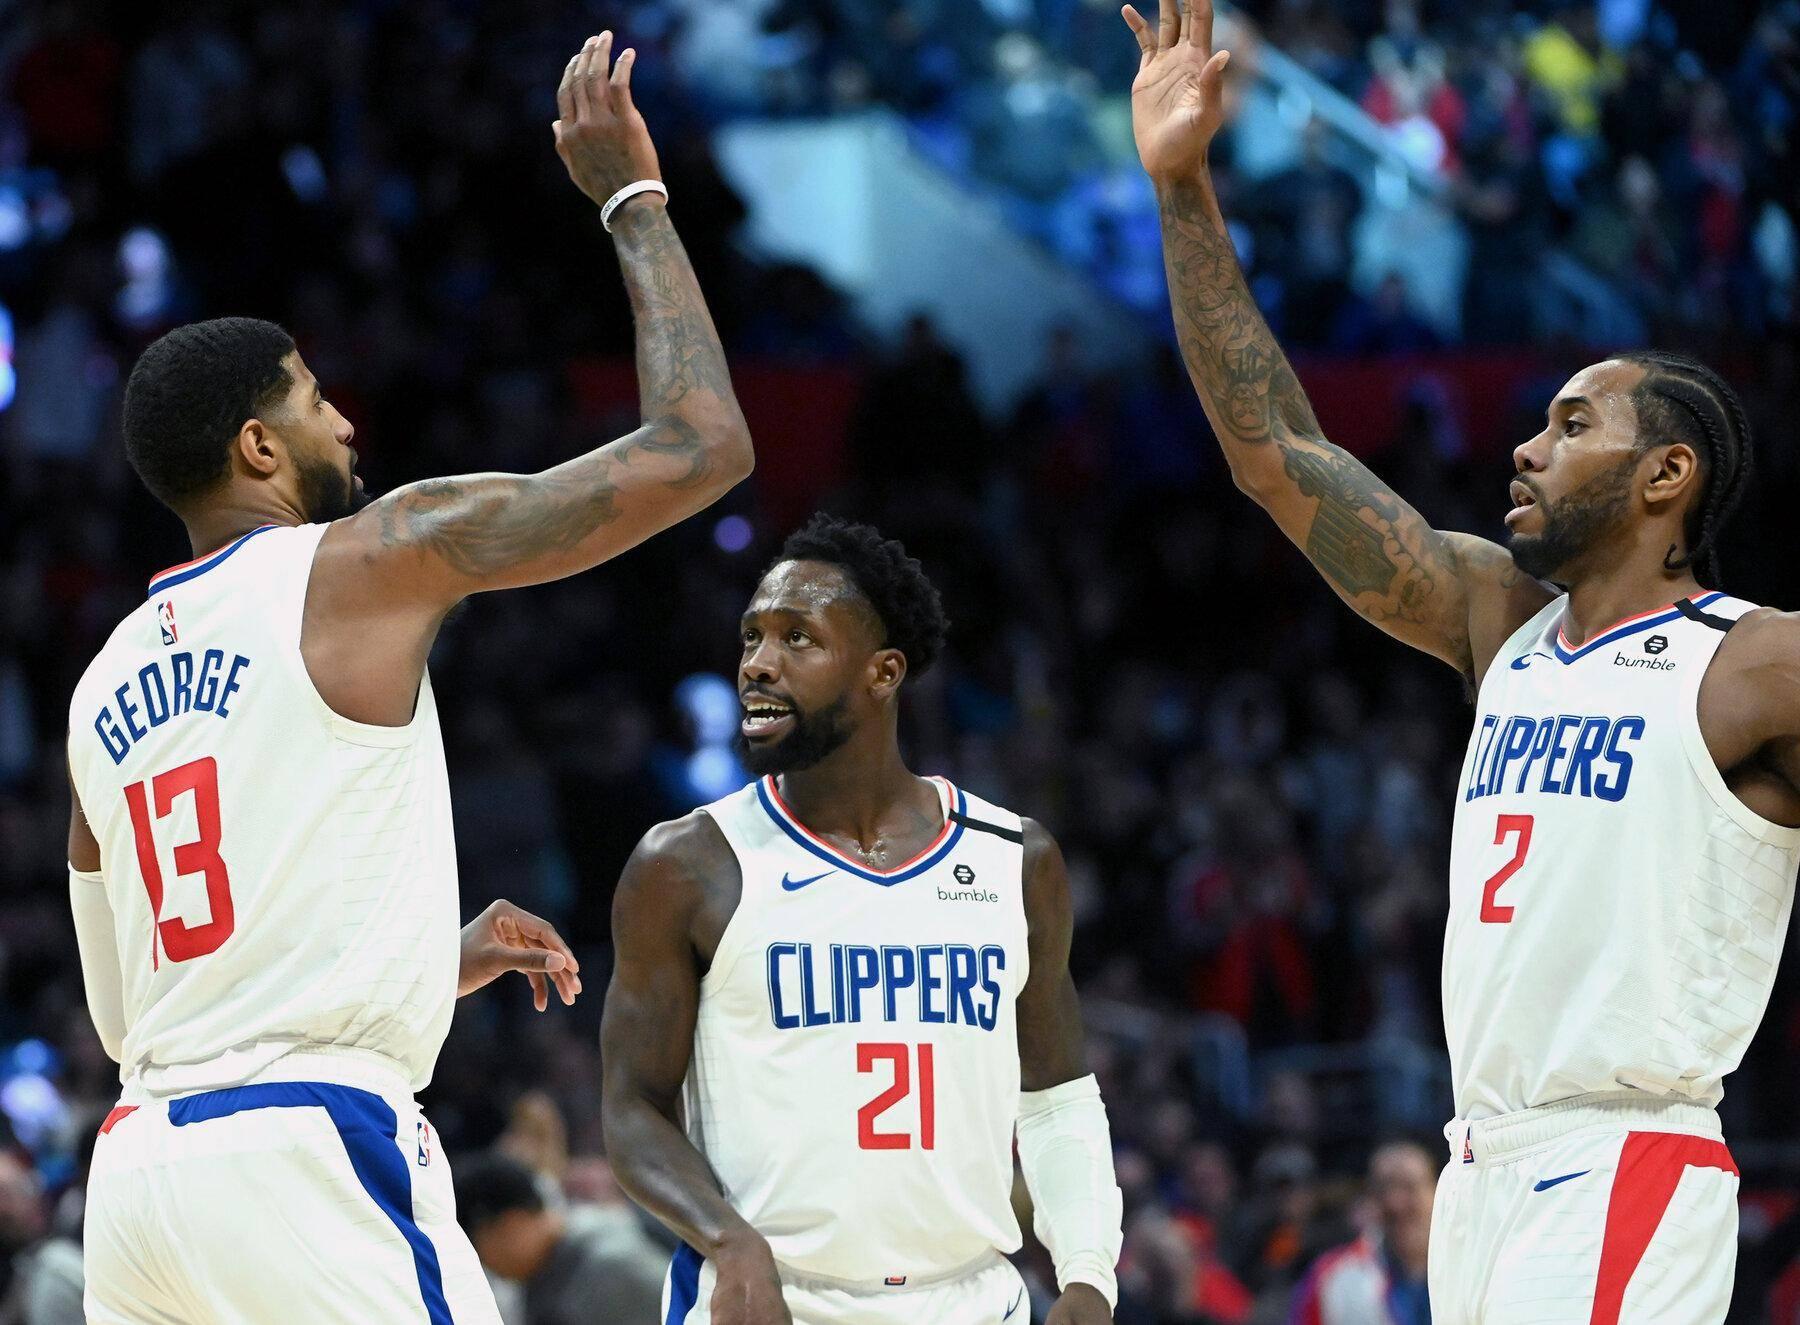 NBA:洛杉矶快船 VS 密尔沃基雄鹿,周一篮球赛事前瞻